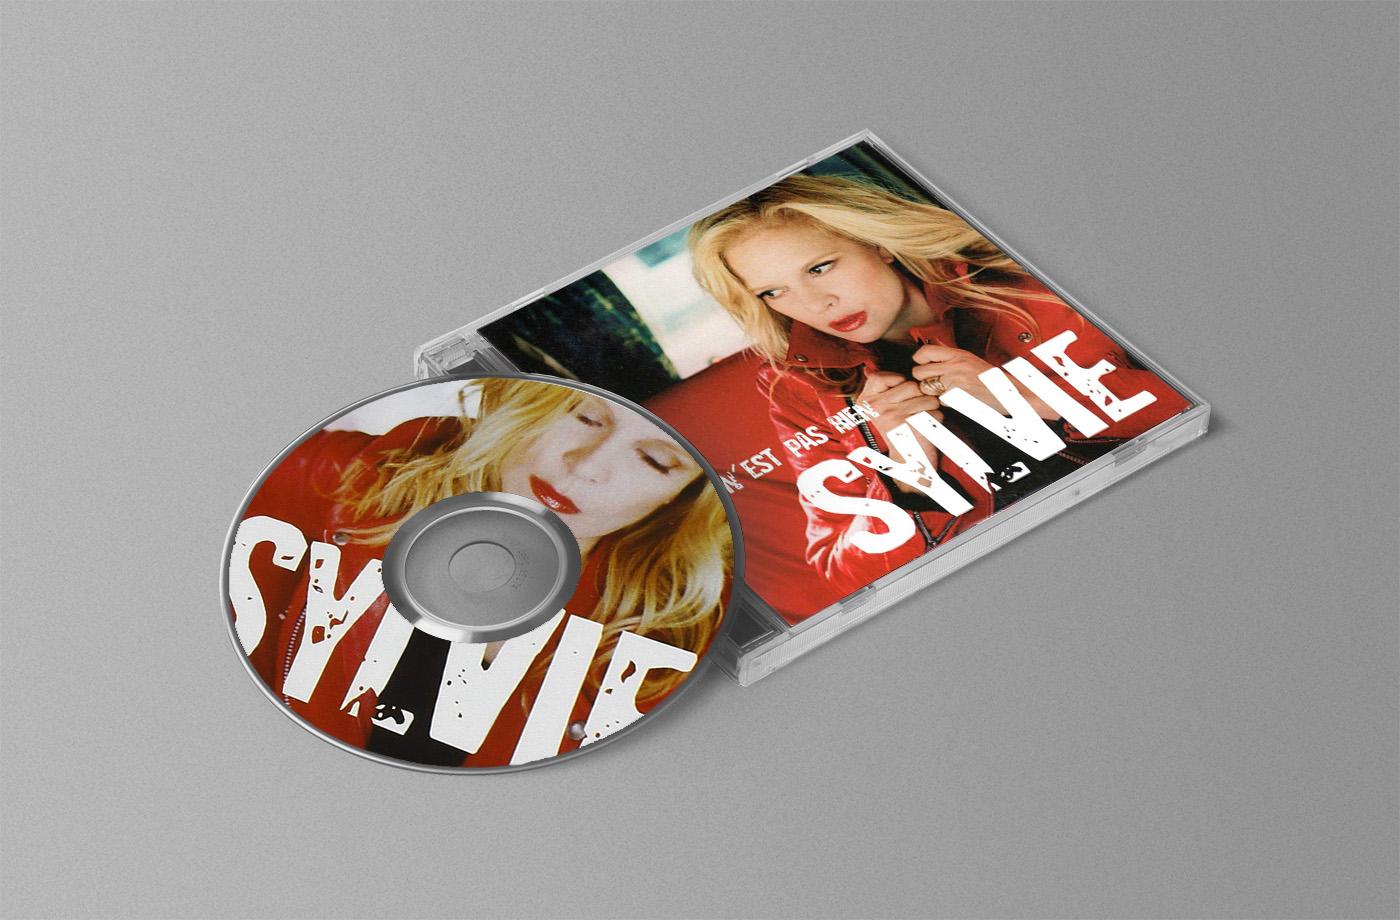 souleyman-conception-cd-livrzet-print- copie